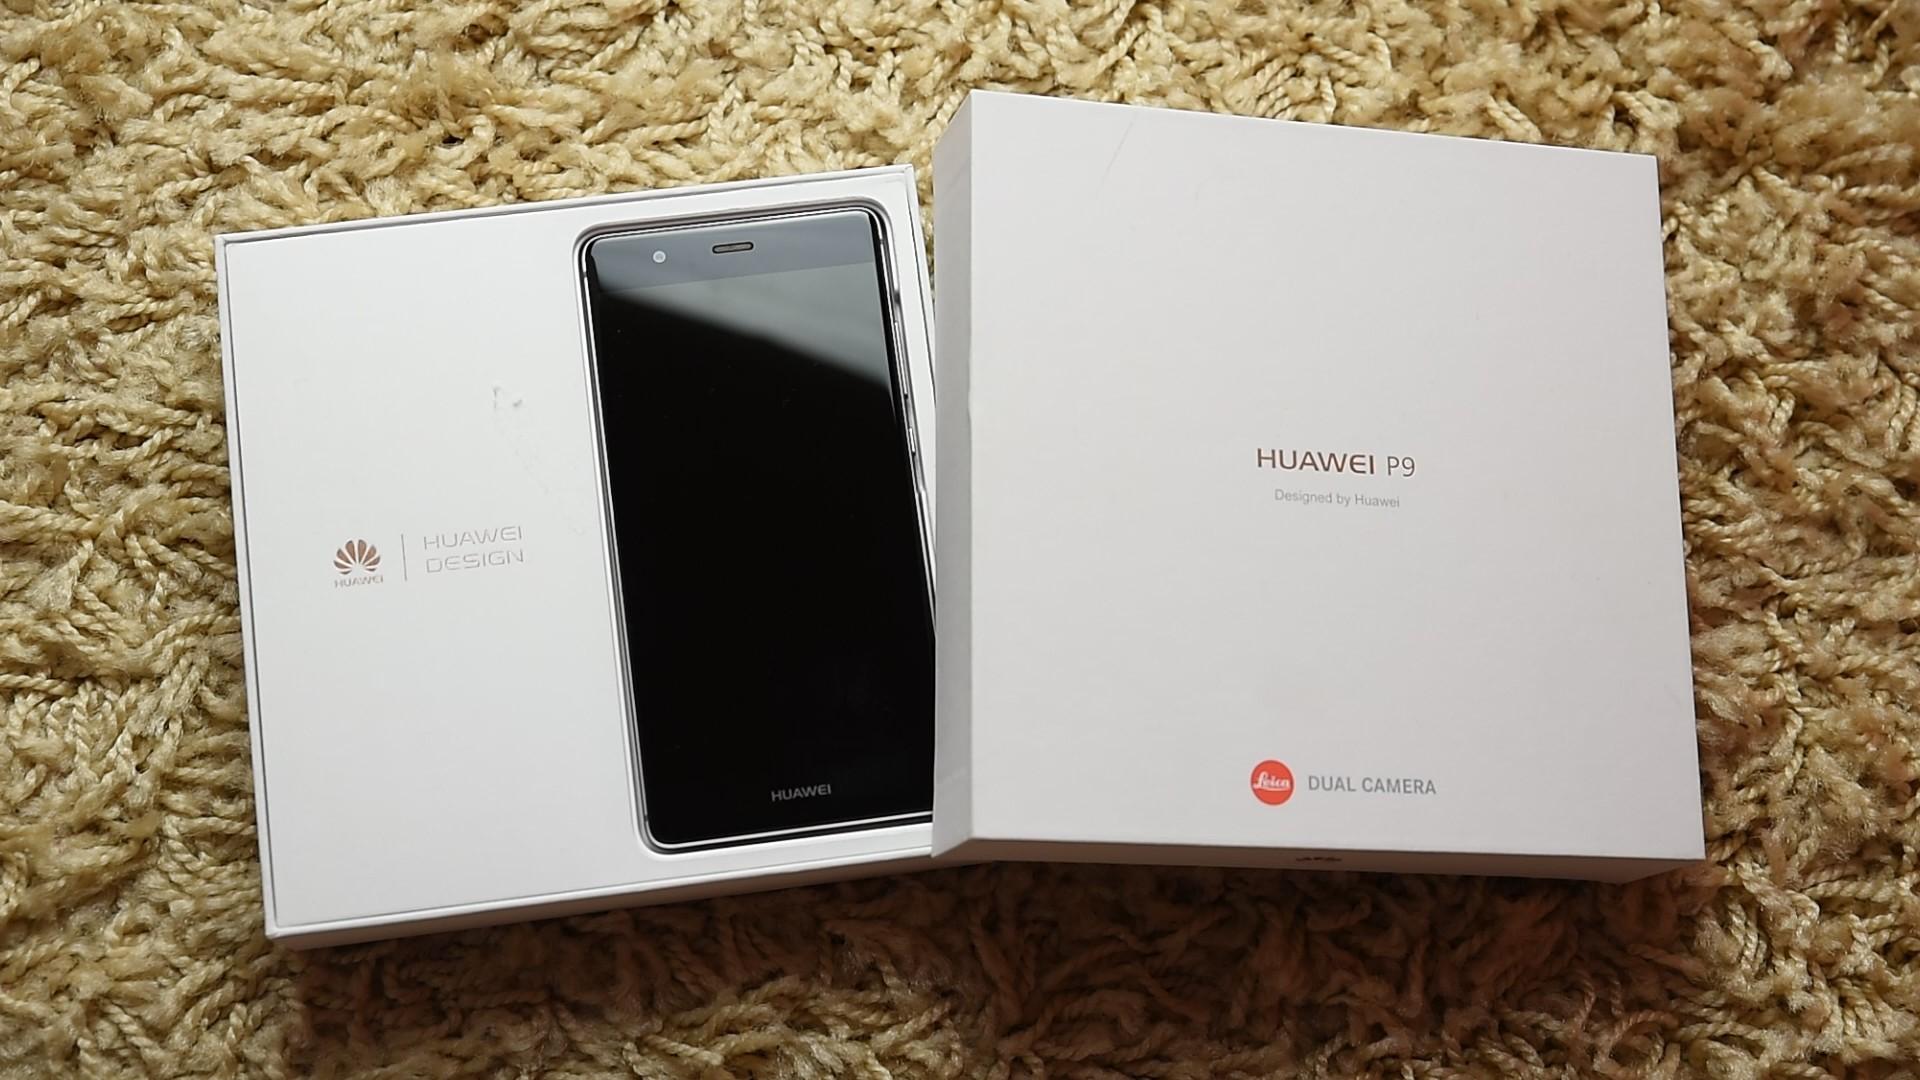 Huawei-p9-recenzja-01